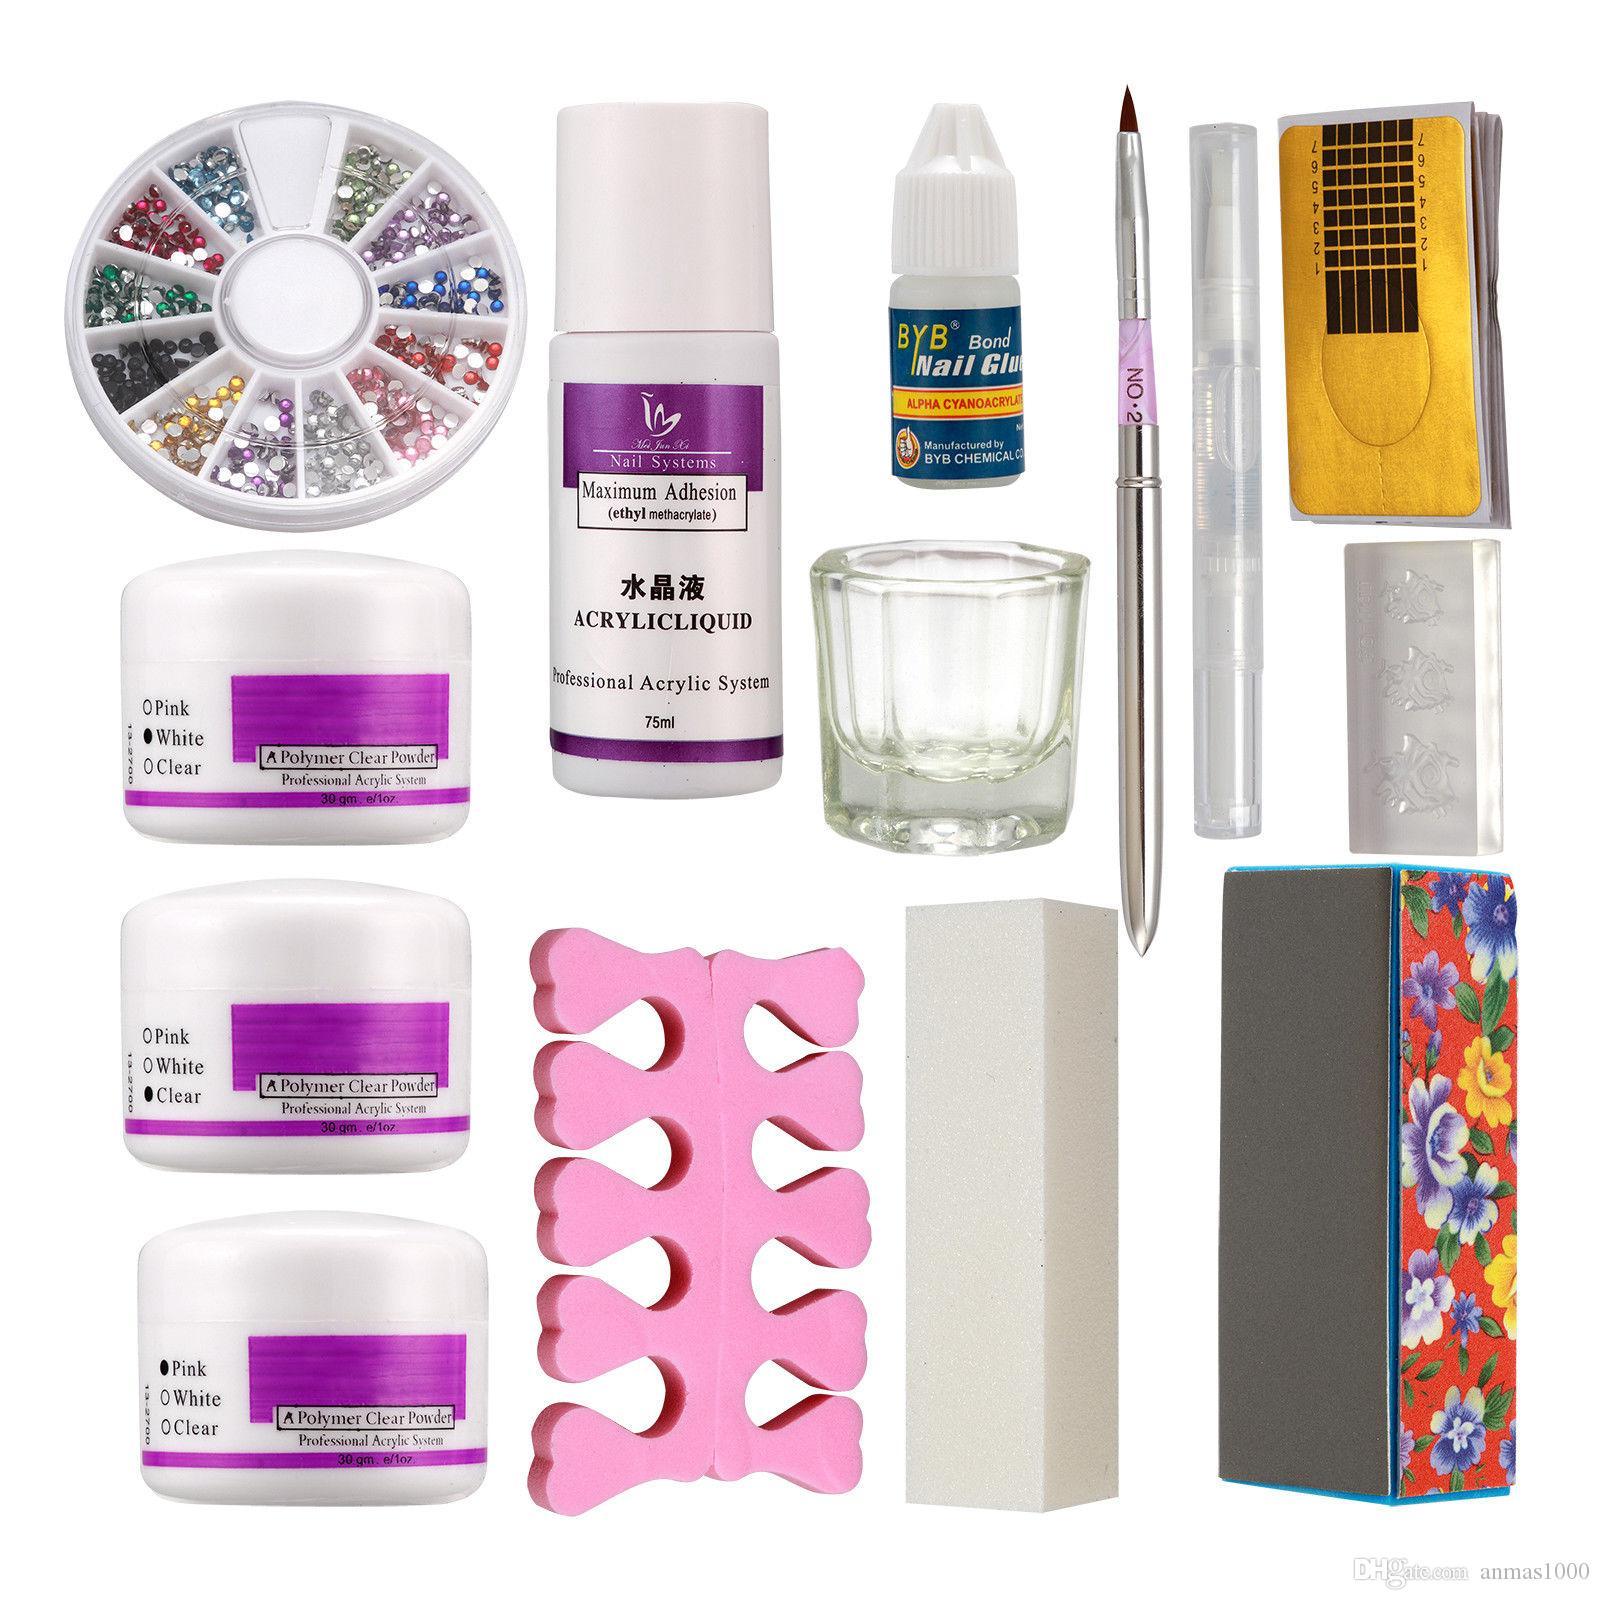 Hot Sale !!!! Pro Acrylic Liquid Primer Nail Art Glue Powder ...